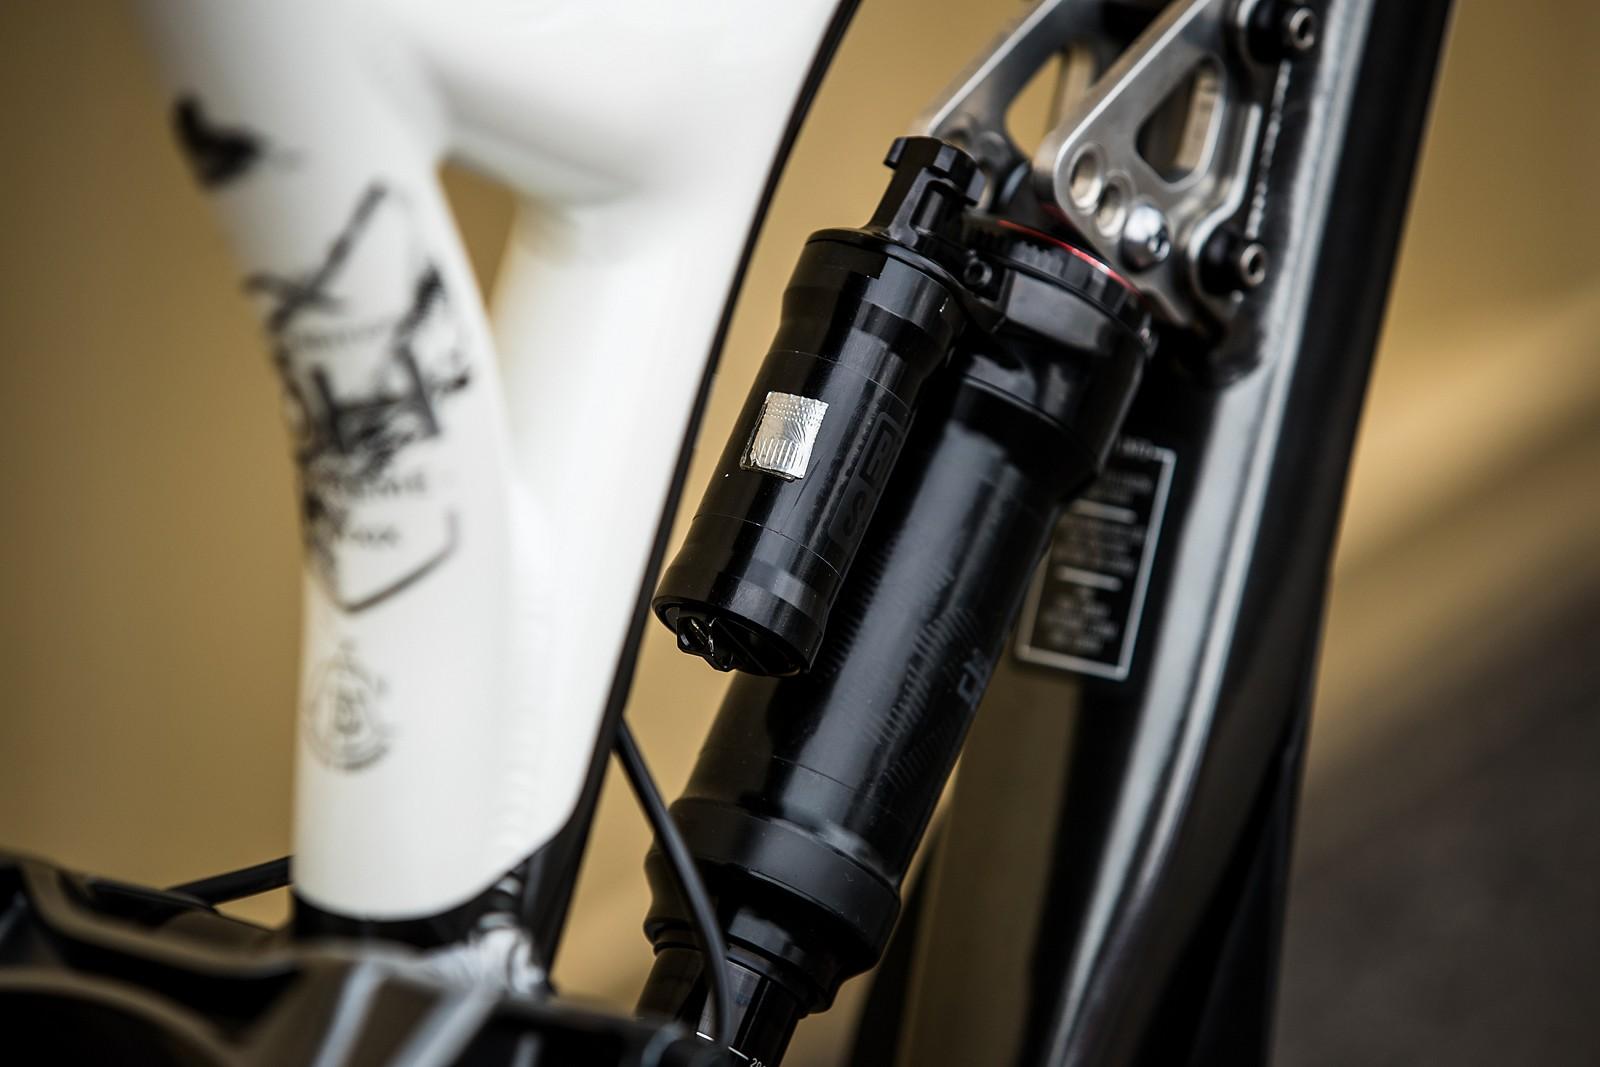 Remi Thirion's World Champs Commencal Supreme - Remi Thirion's World Champs Commencal Supreme - Mountain Biking Pictures - Vital MTB